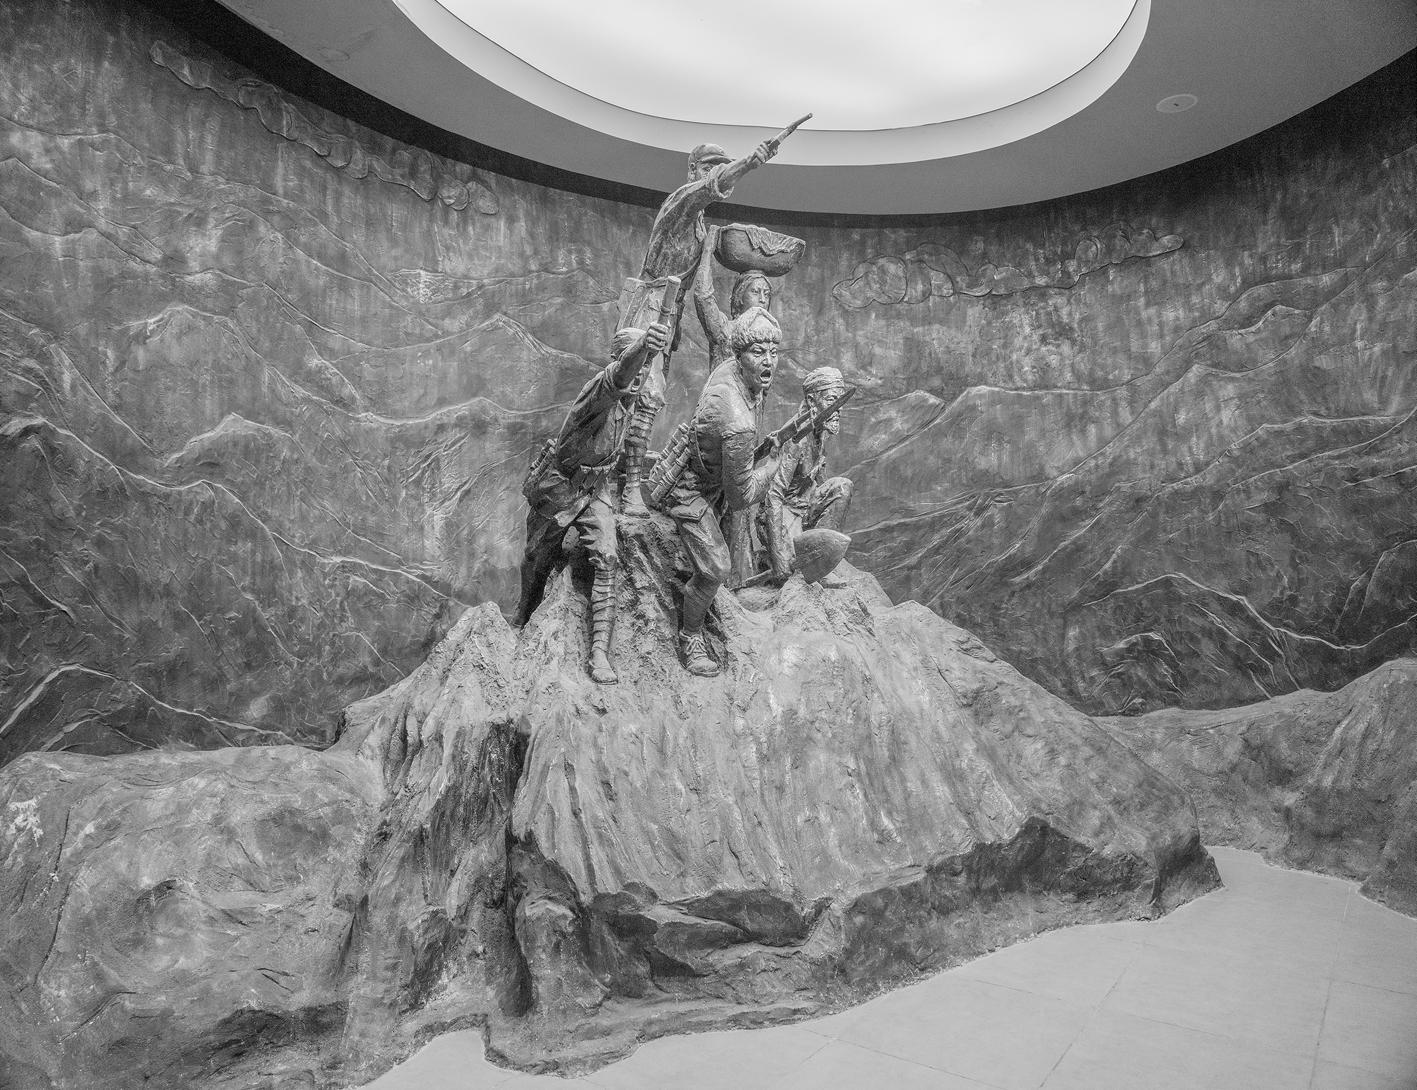 TMRP.Monument-1,120x150cm,C print,2017-1